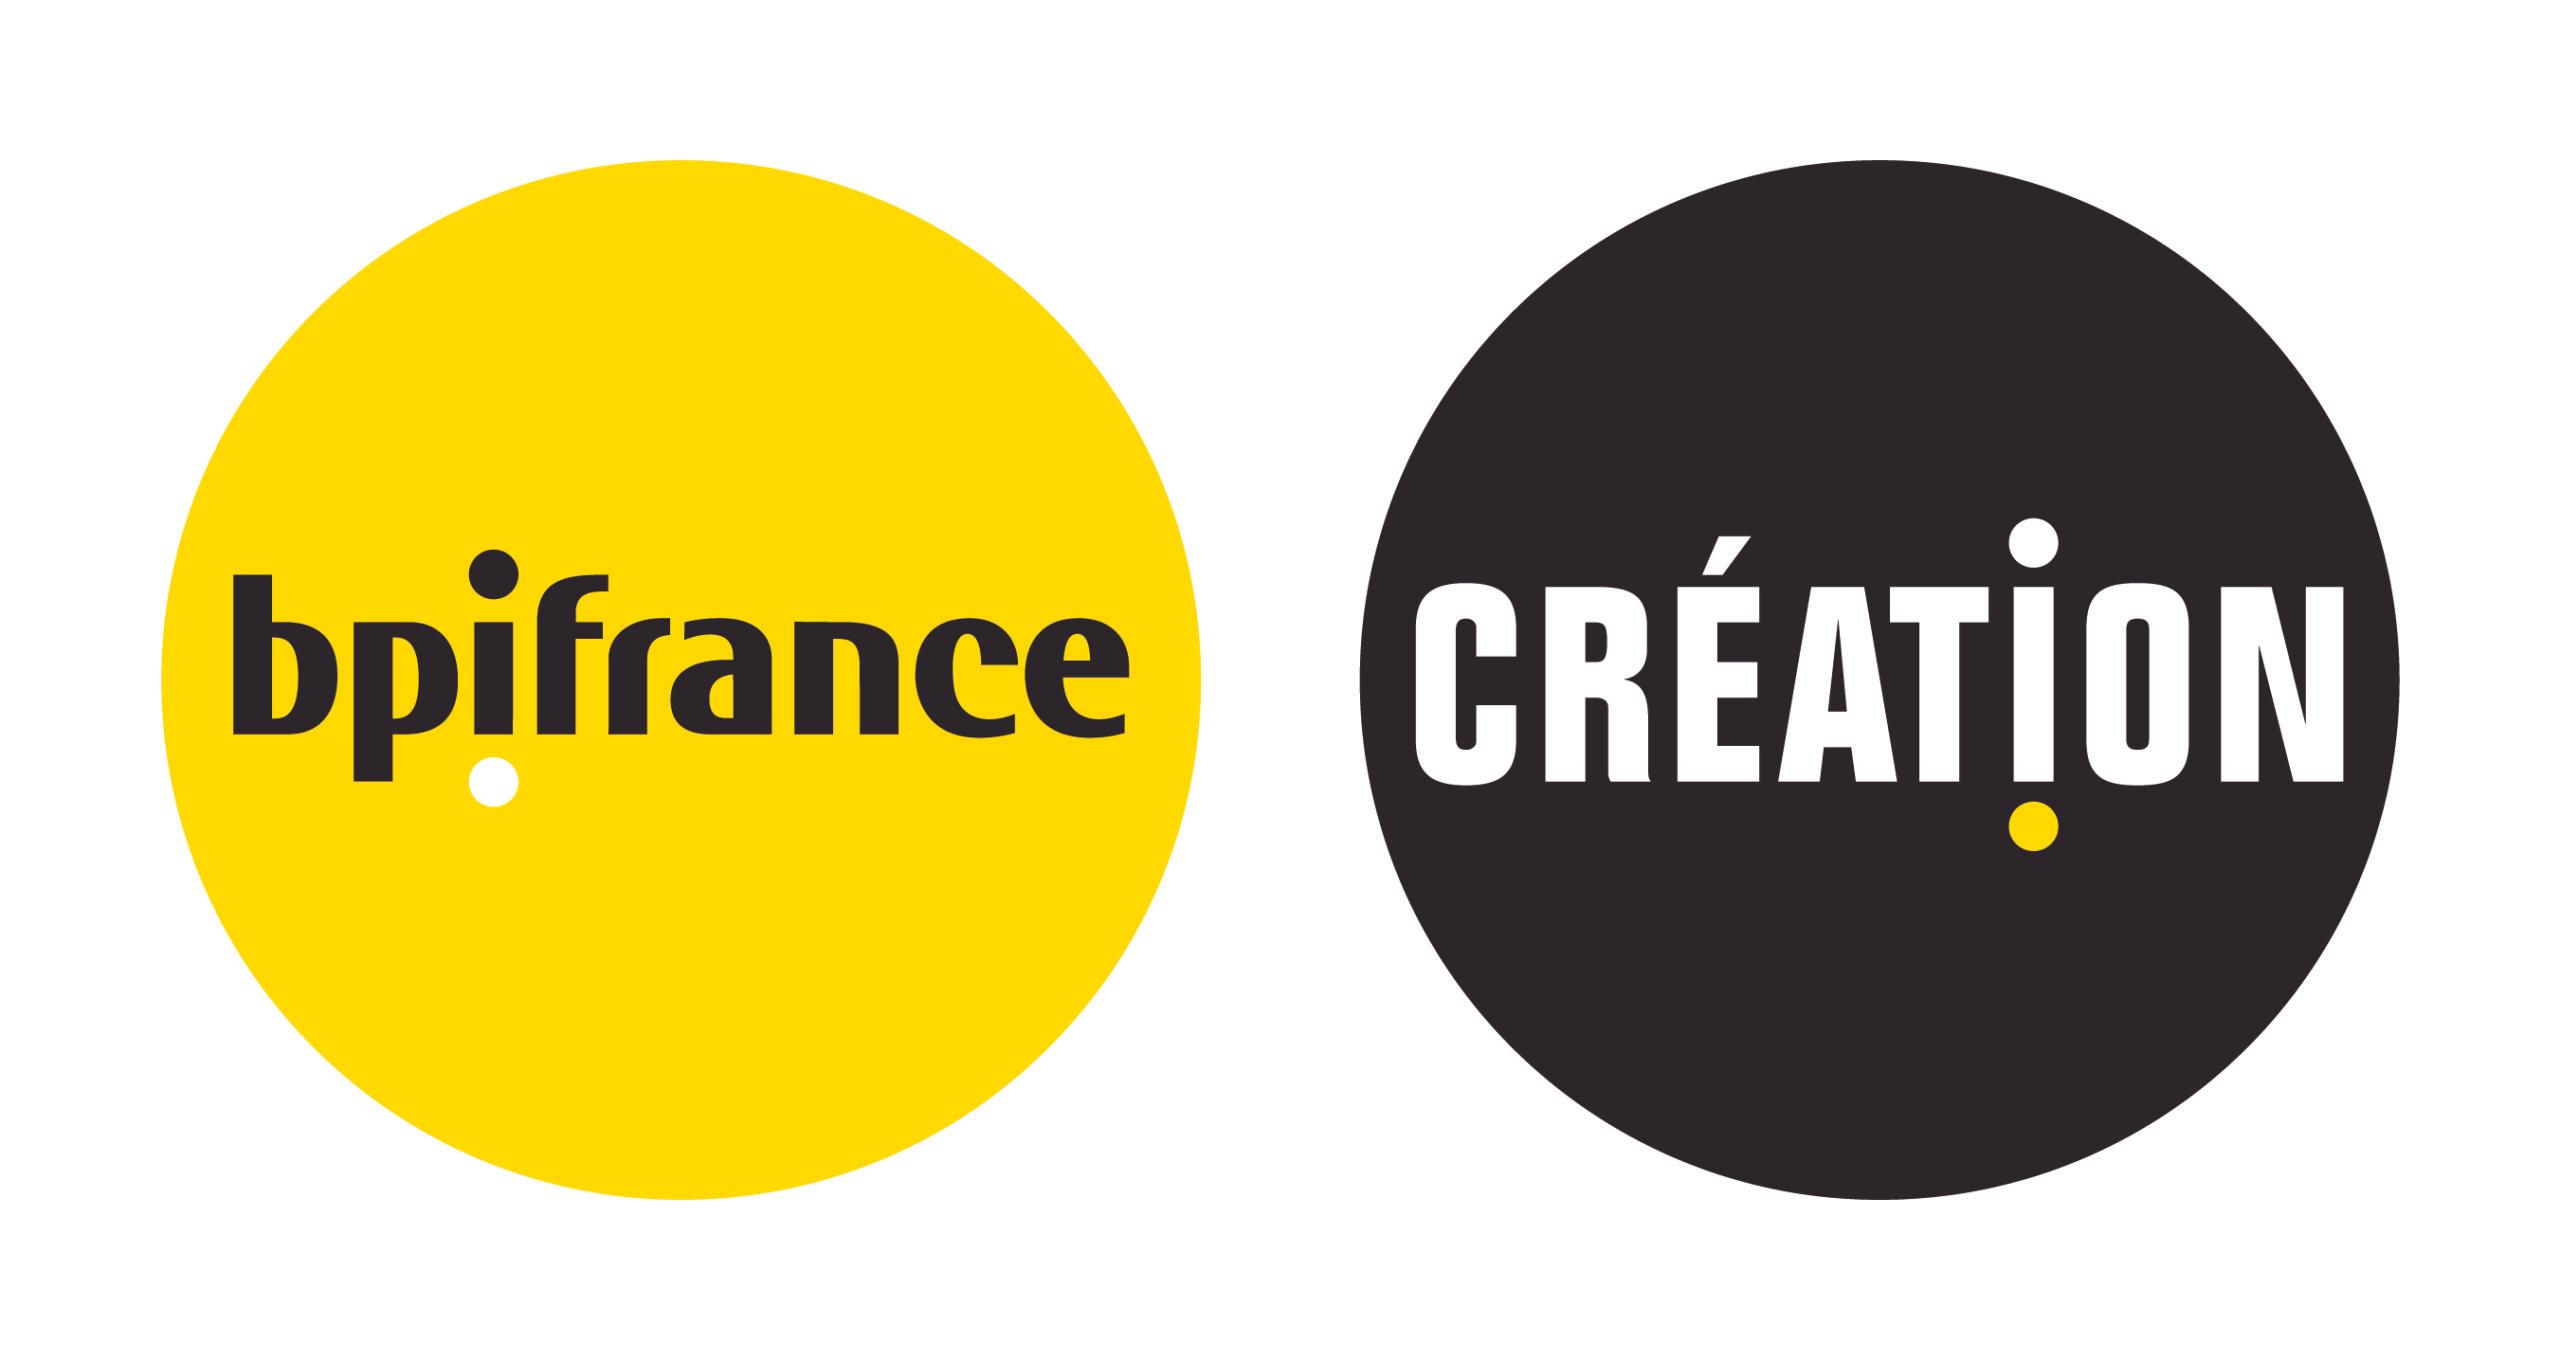 Logo-BPI-France-Création